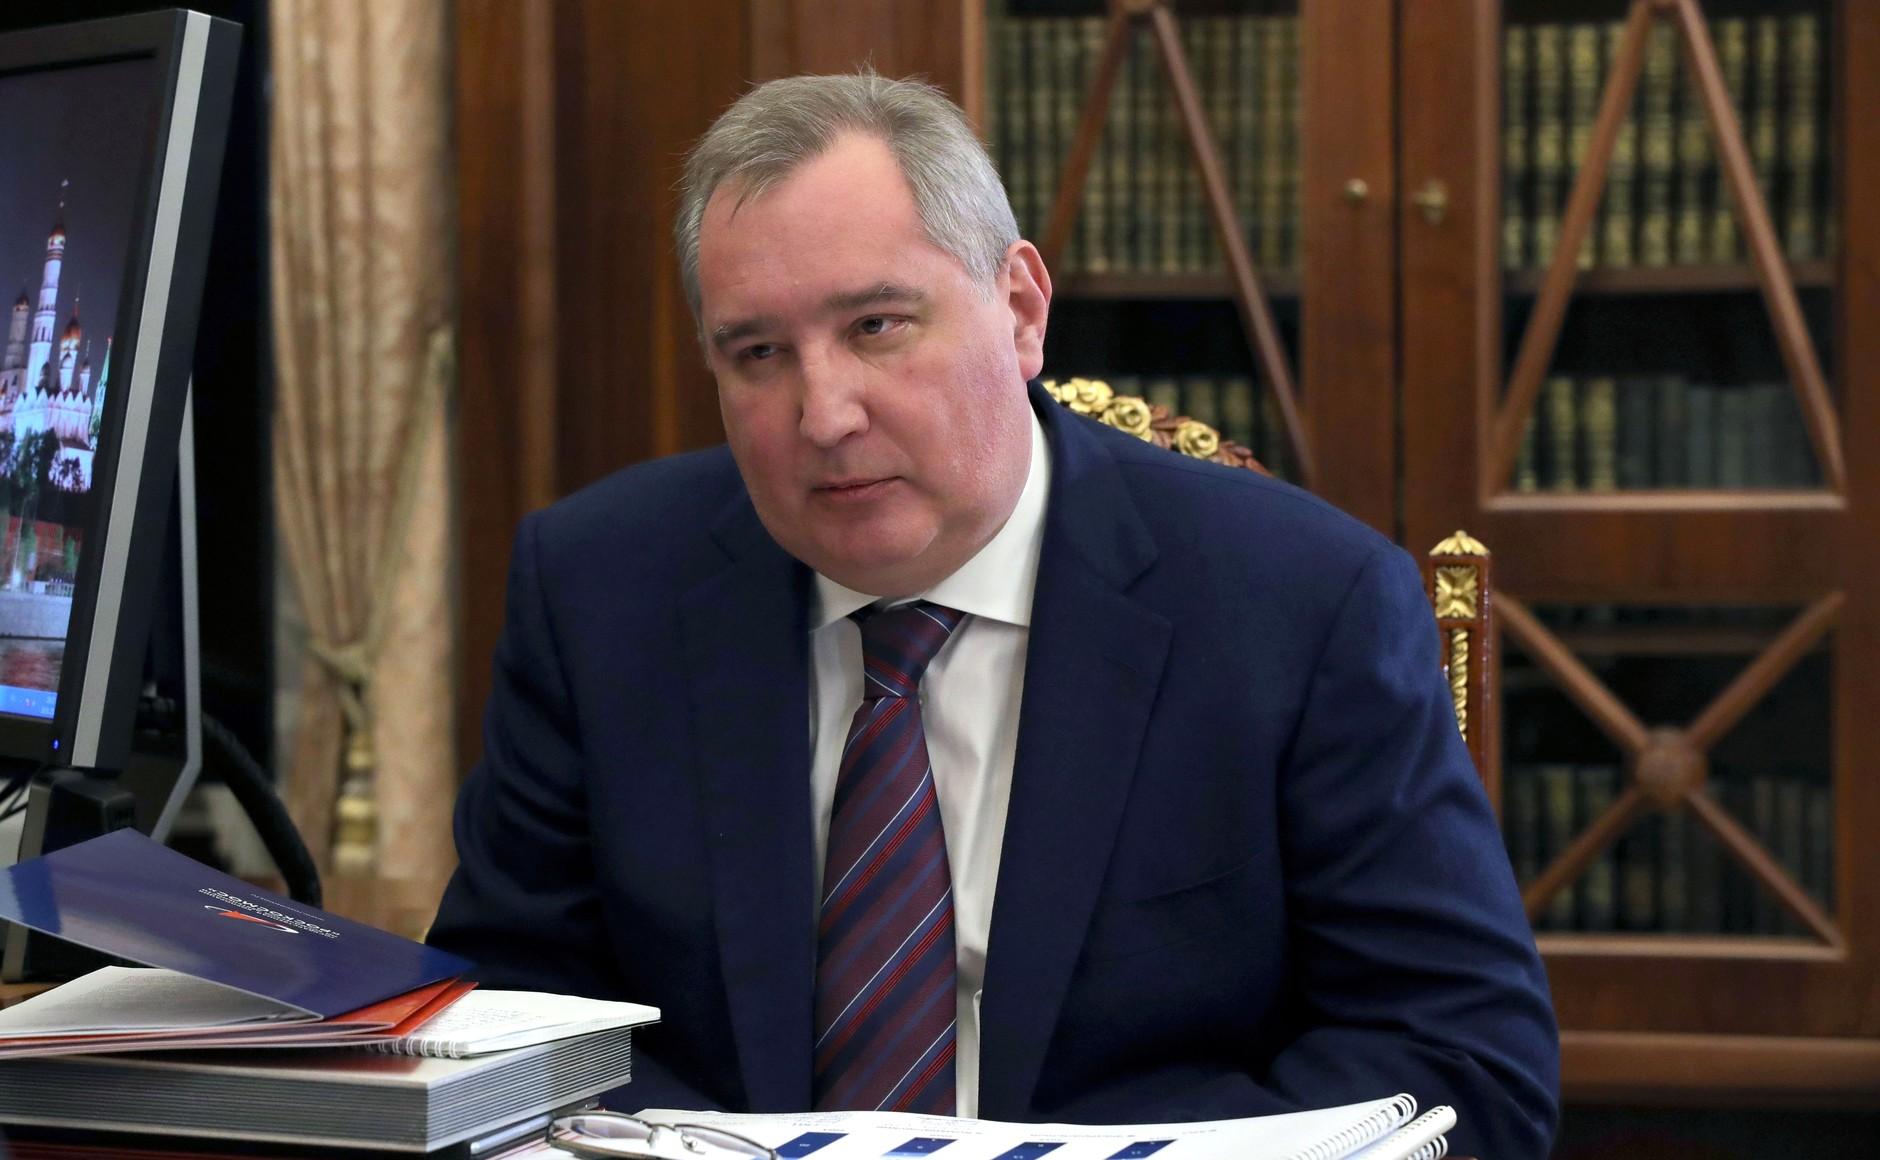 ROSCOSMOS 2 SUR 3 Rencontre avec le chef de Roscosmos Dmitry Rogozin 20.02.2021